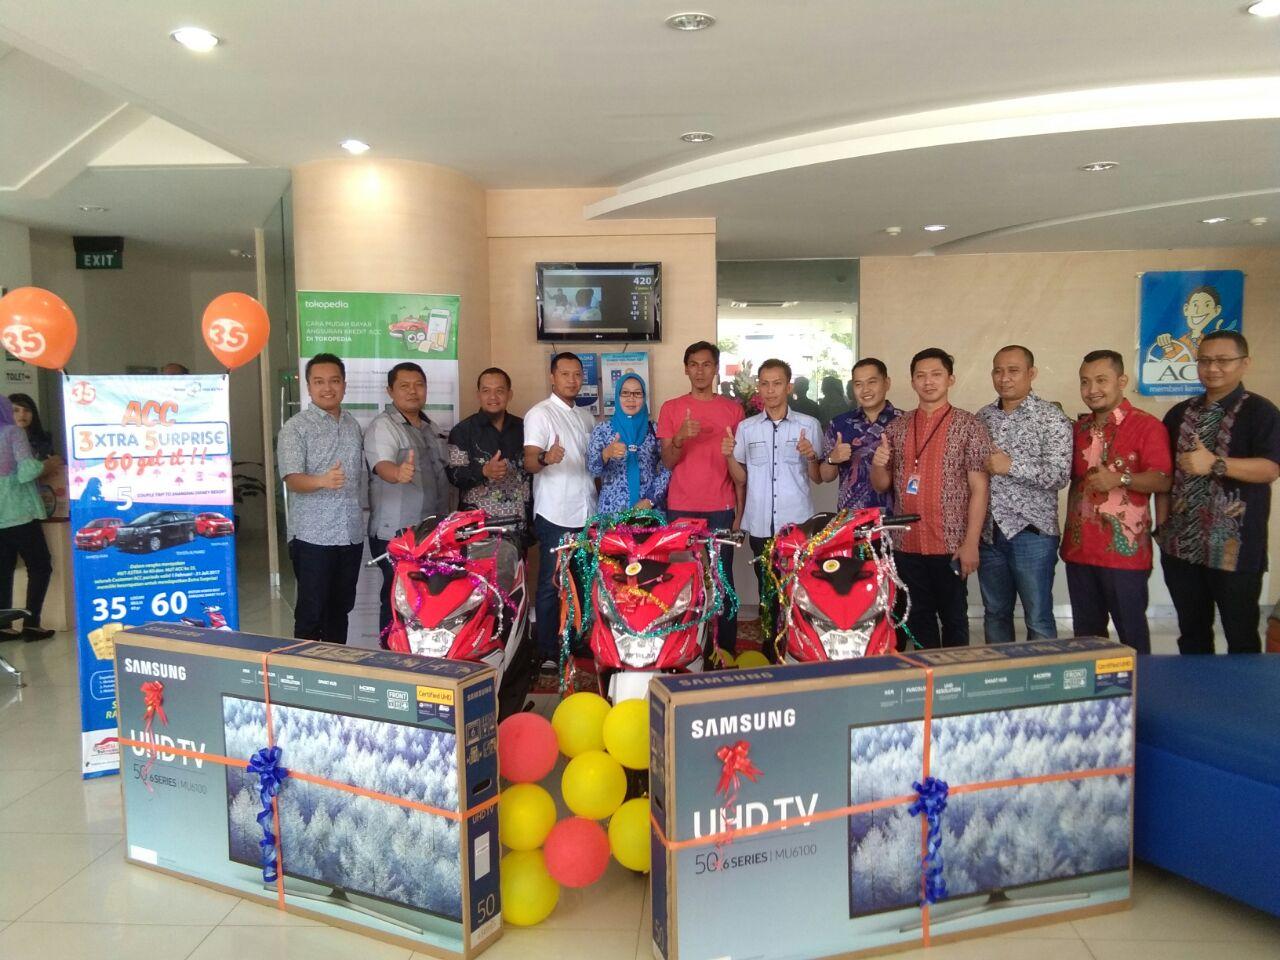 ACC Bandar Lampung Serahkan Hadiah 3xtra 5urprise Kepada Pemenang